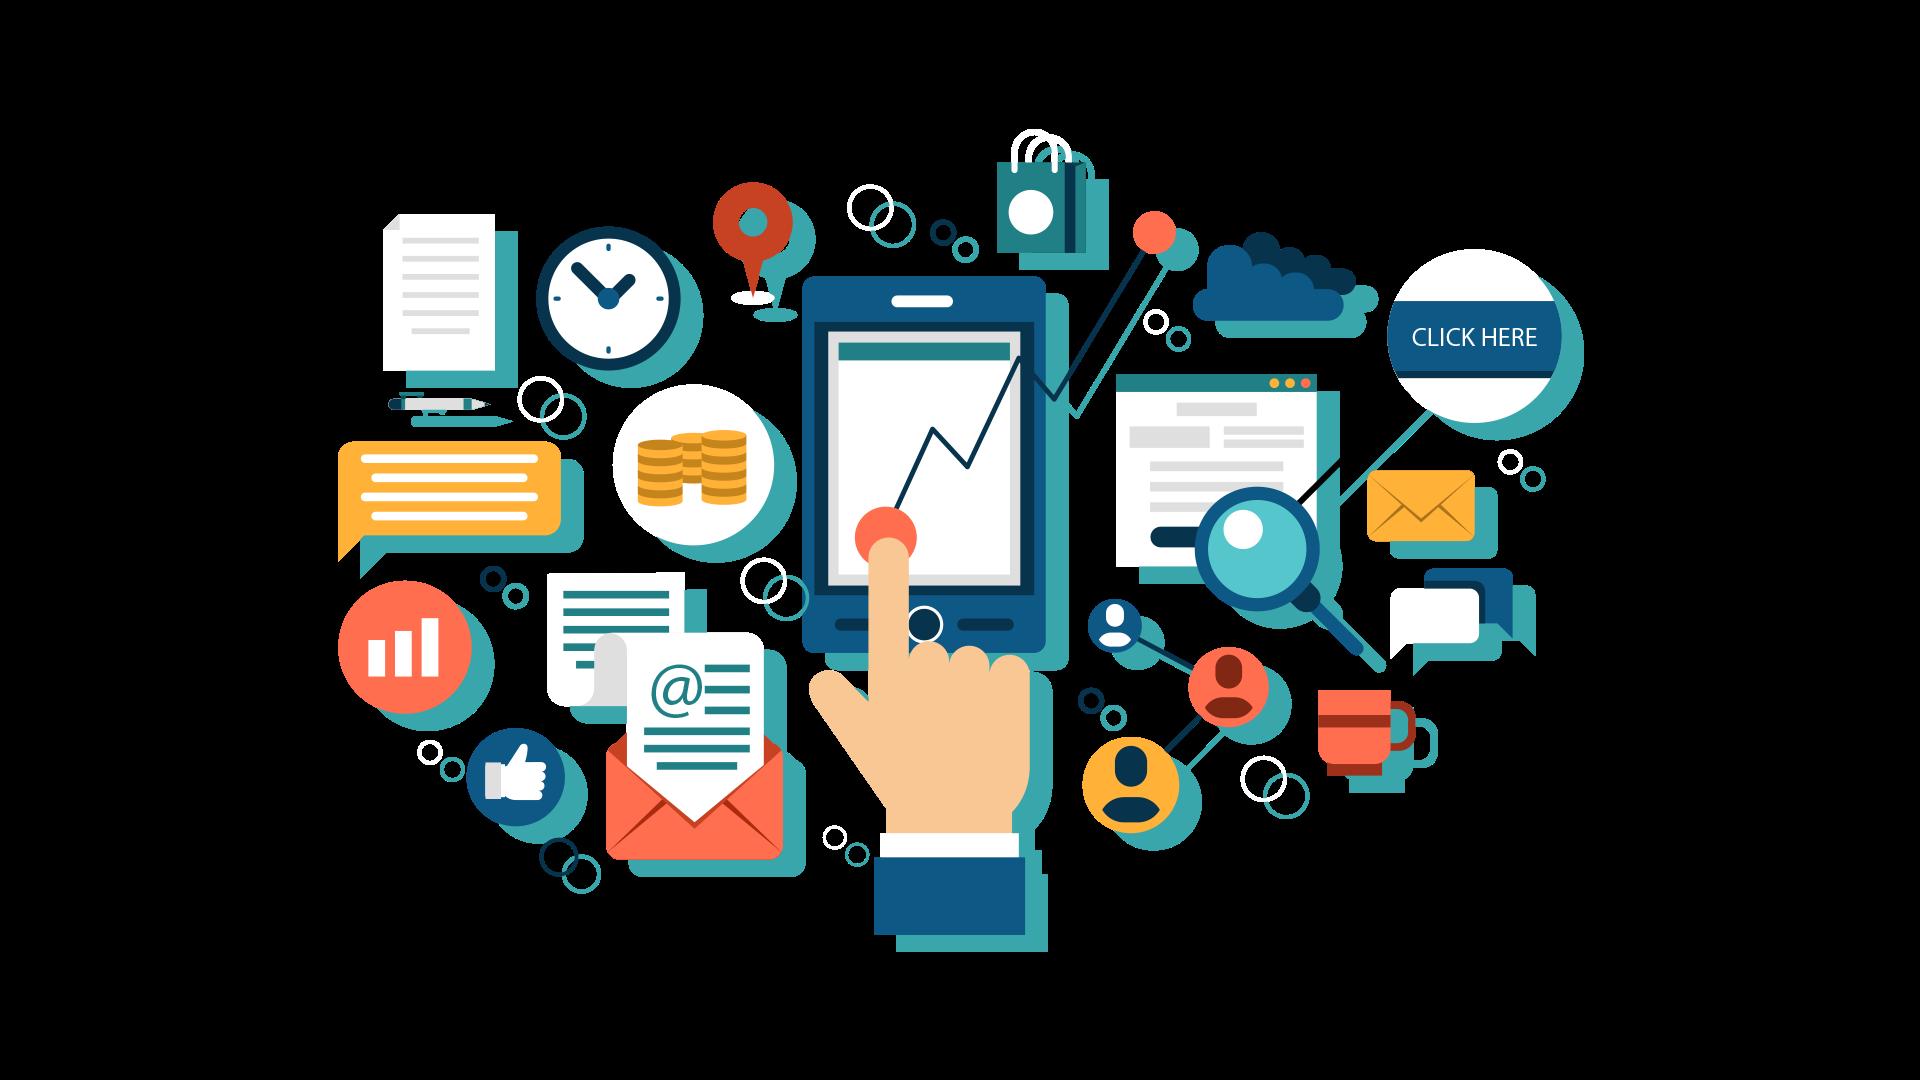 Digital-Marketing-Trends-for-2018.png